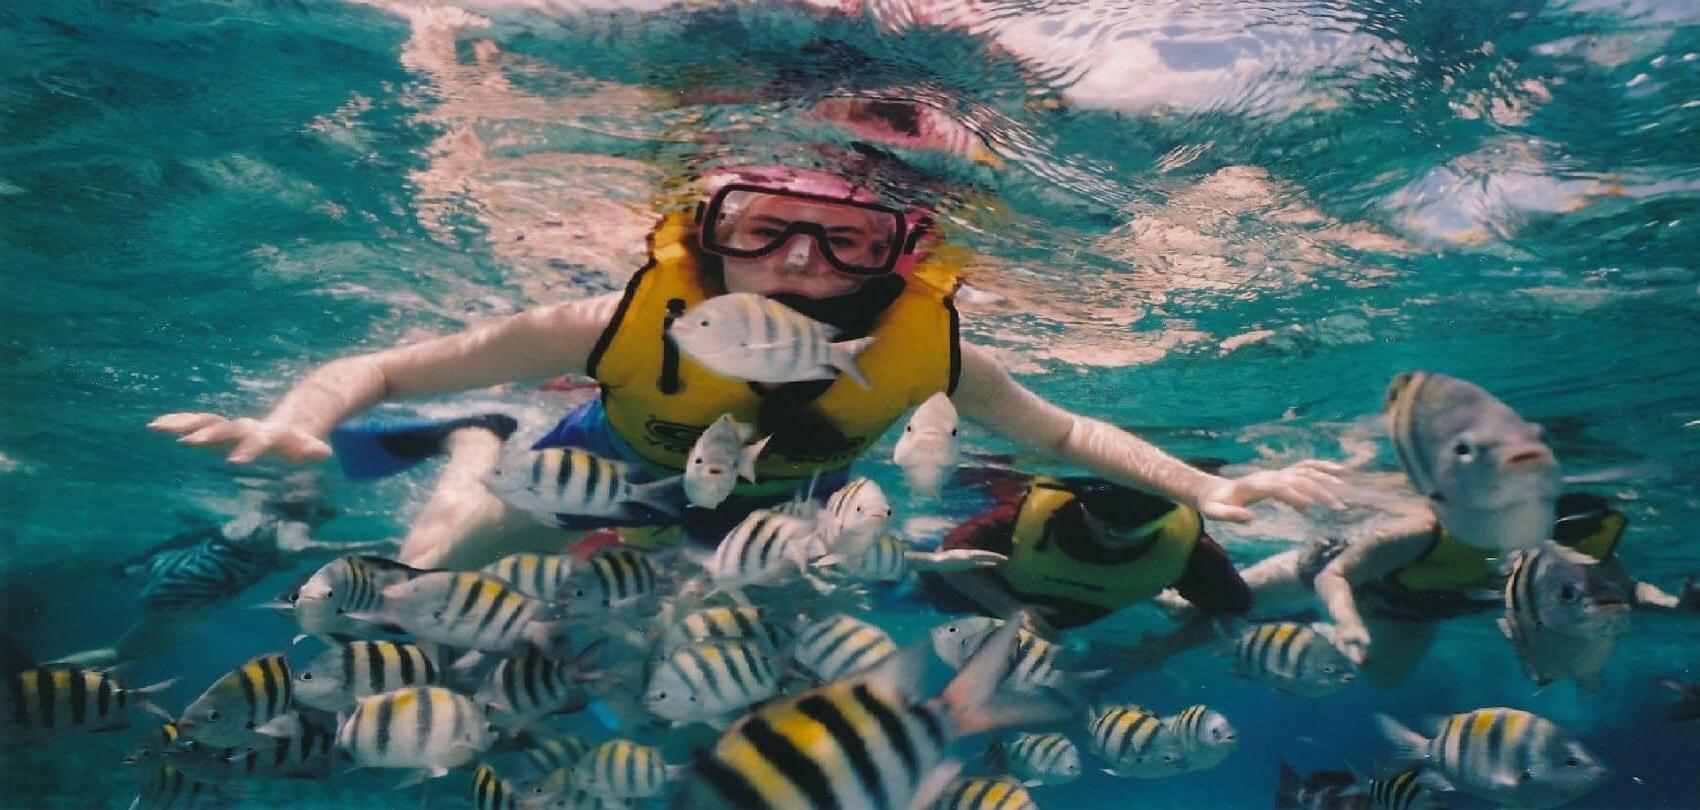 Snorkeling, Cozumel